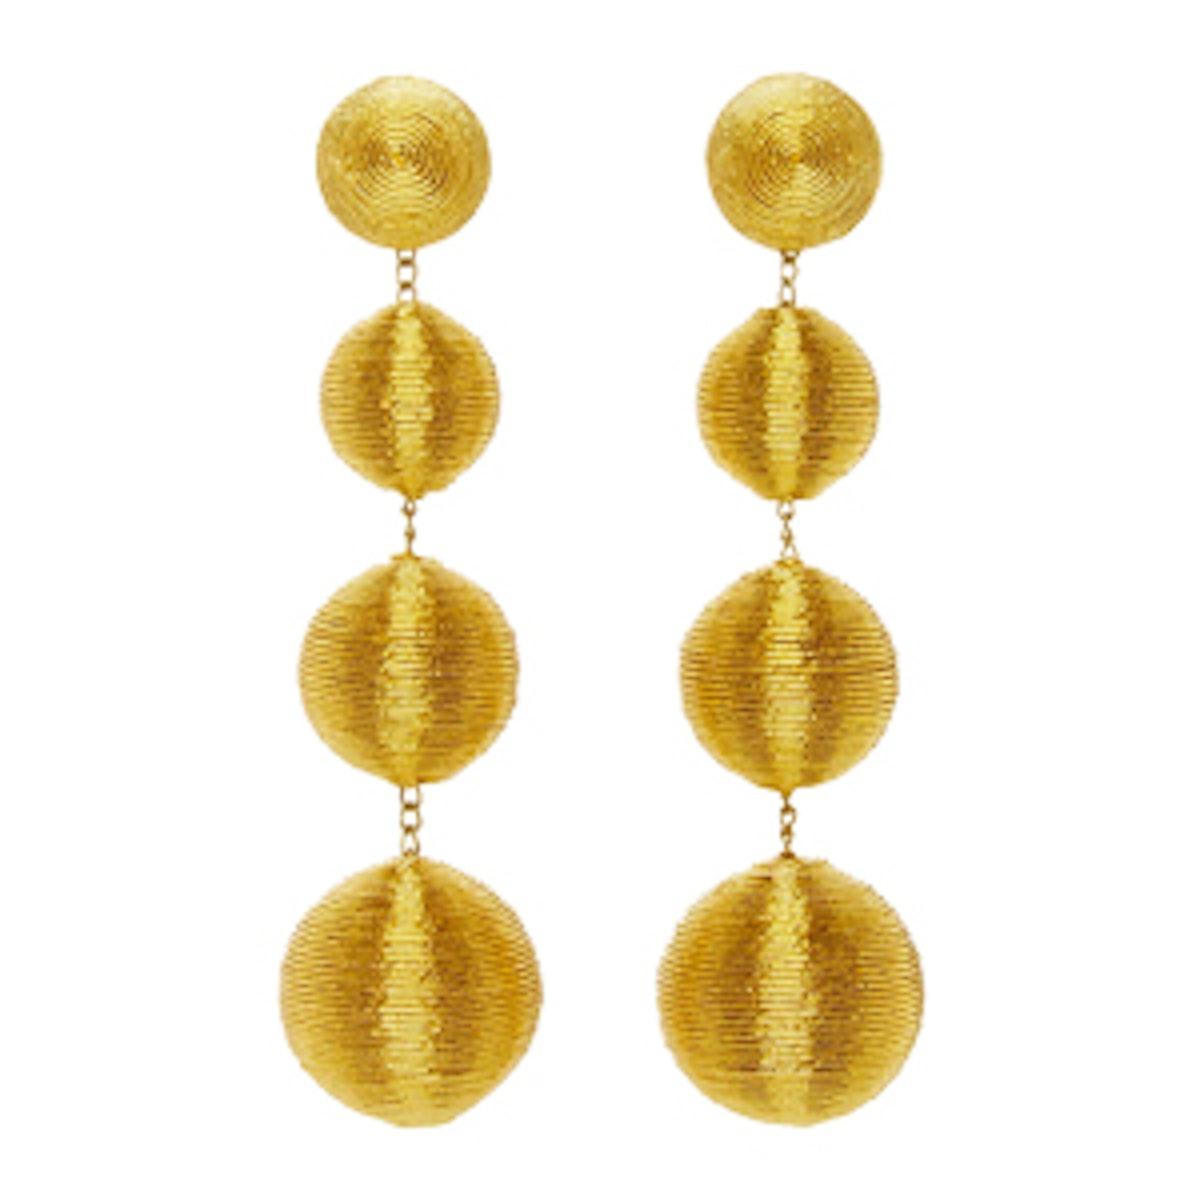 Les Bonbons Caramel Gold II Earrings